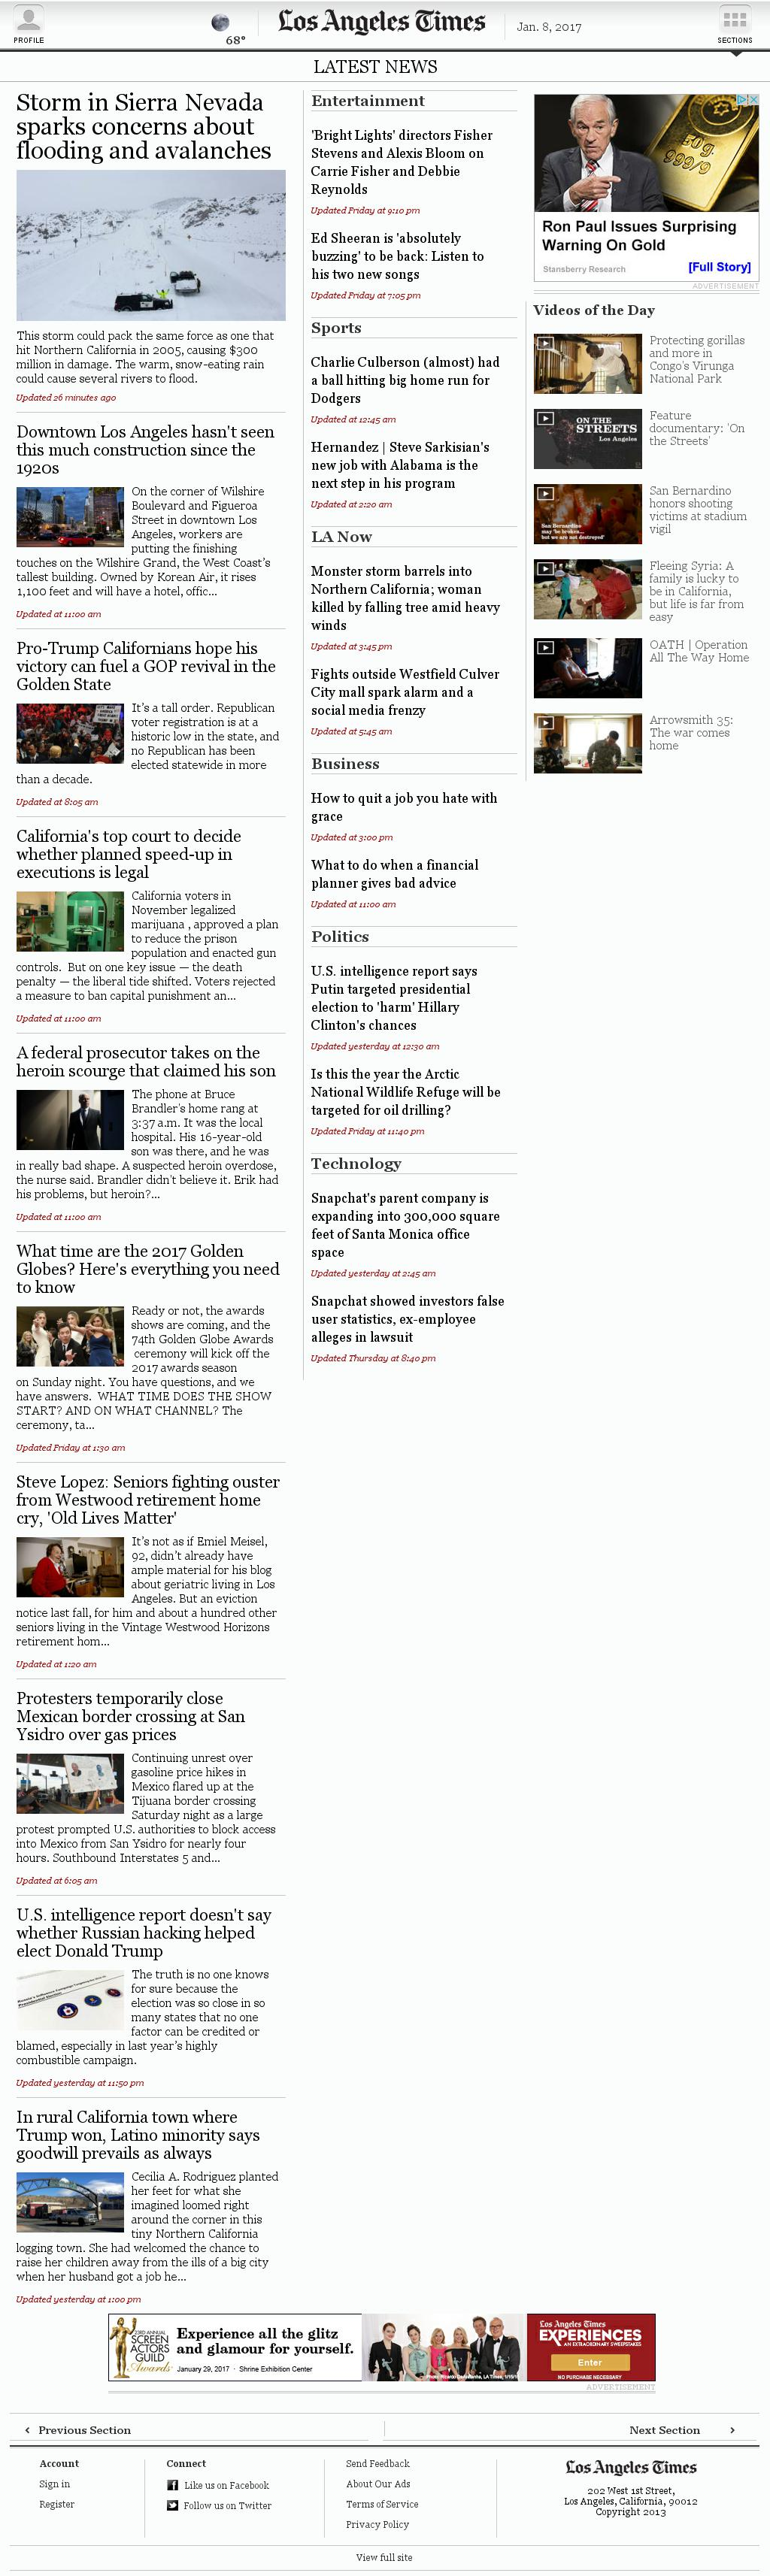 Los Angeles Times at Sunday Jan. 8, 2017, 6:16 p.m. UTC